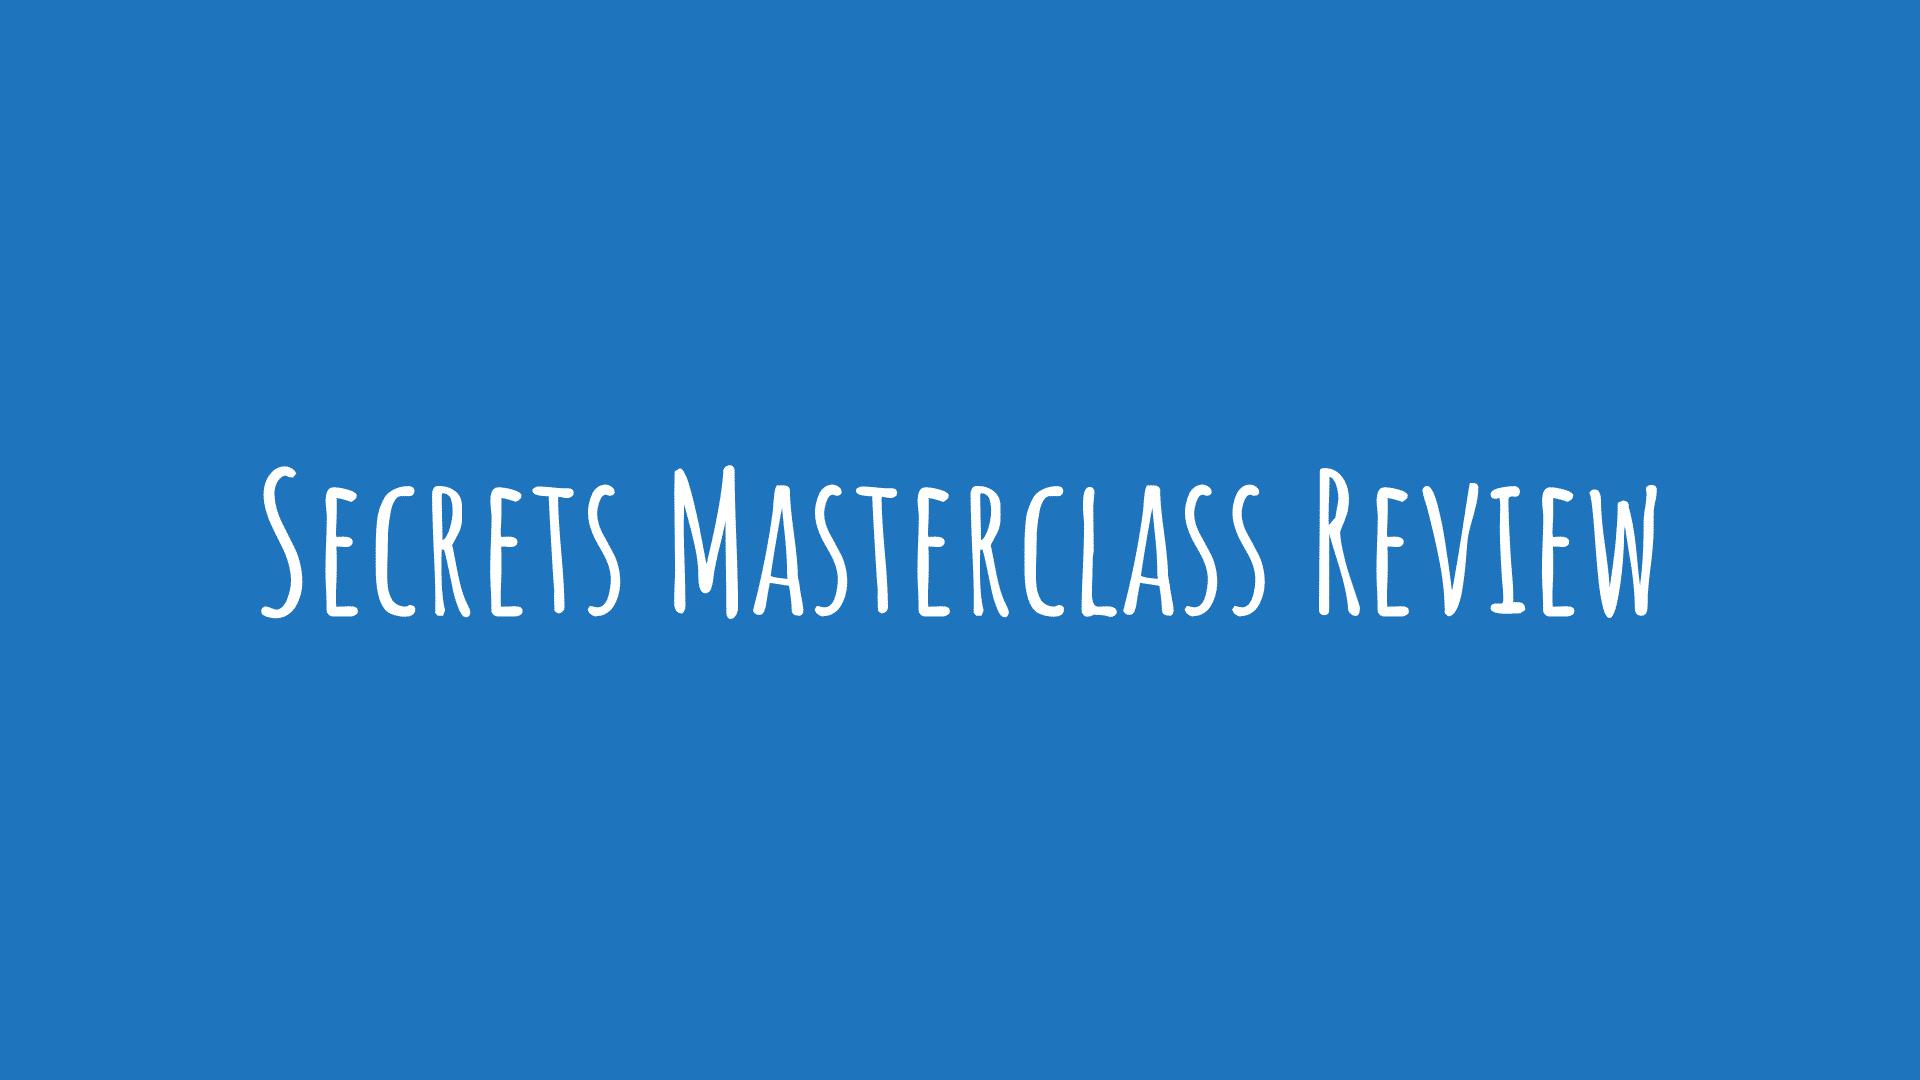 Secrets Masterclass Review